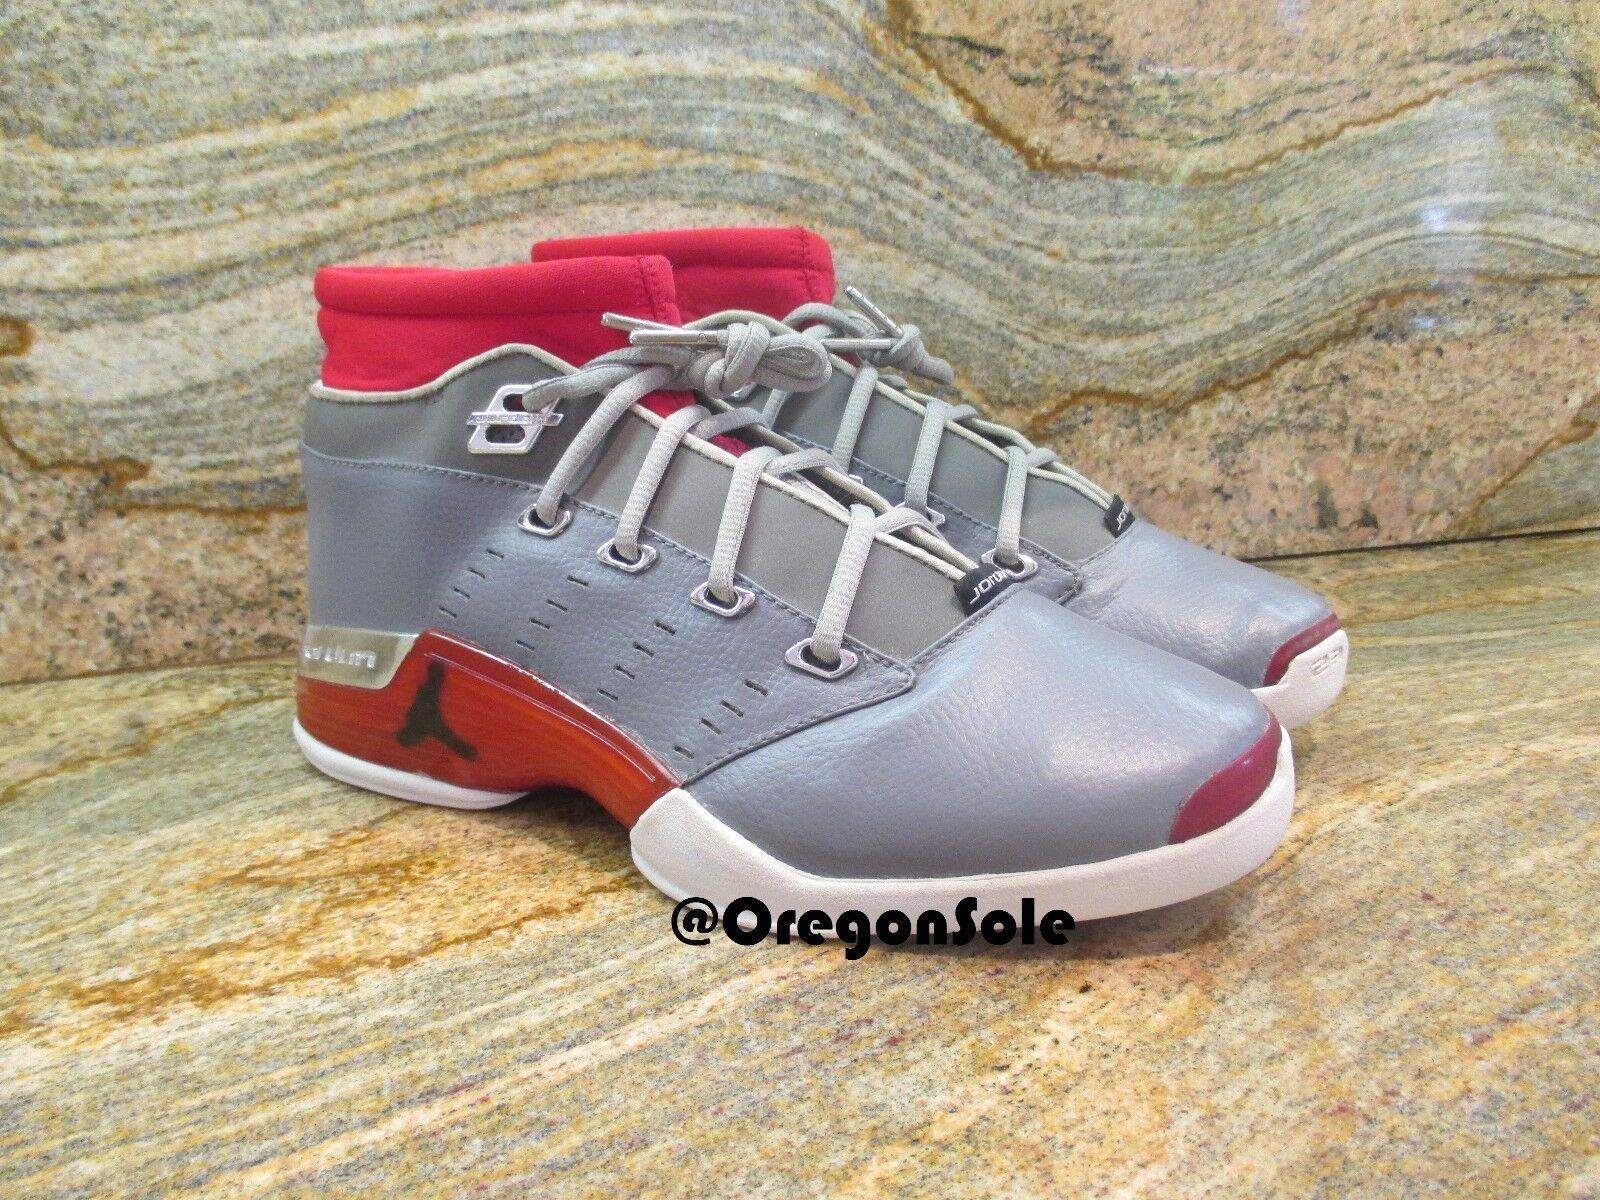 2001 Nike Air Jordan 17 XVII Low UNRELEASED SAMPLE SZ 9 Promo Red OG PE Chrome